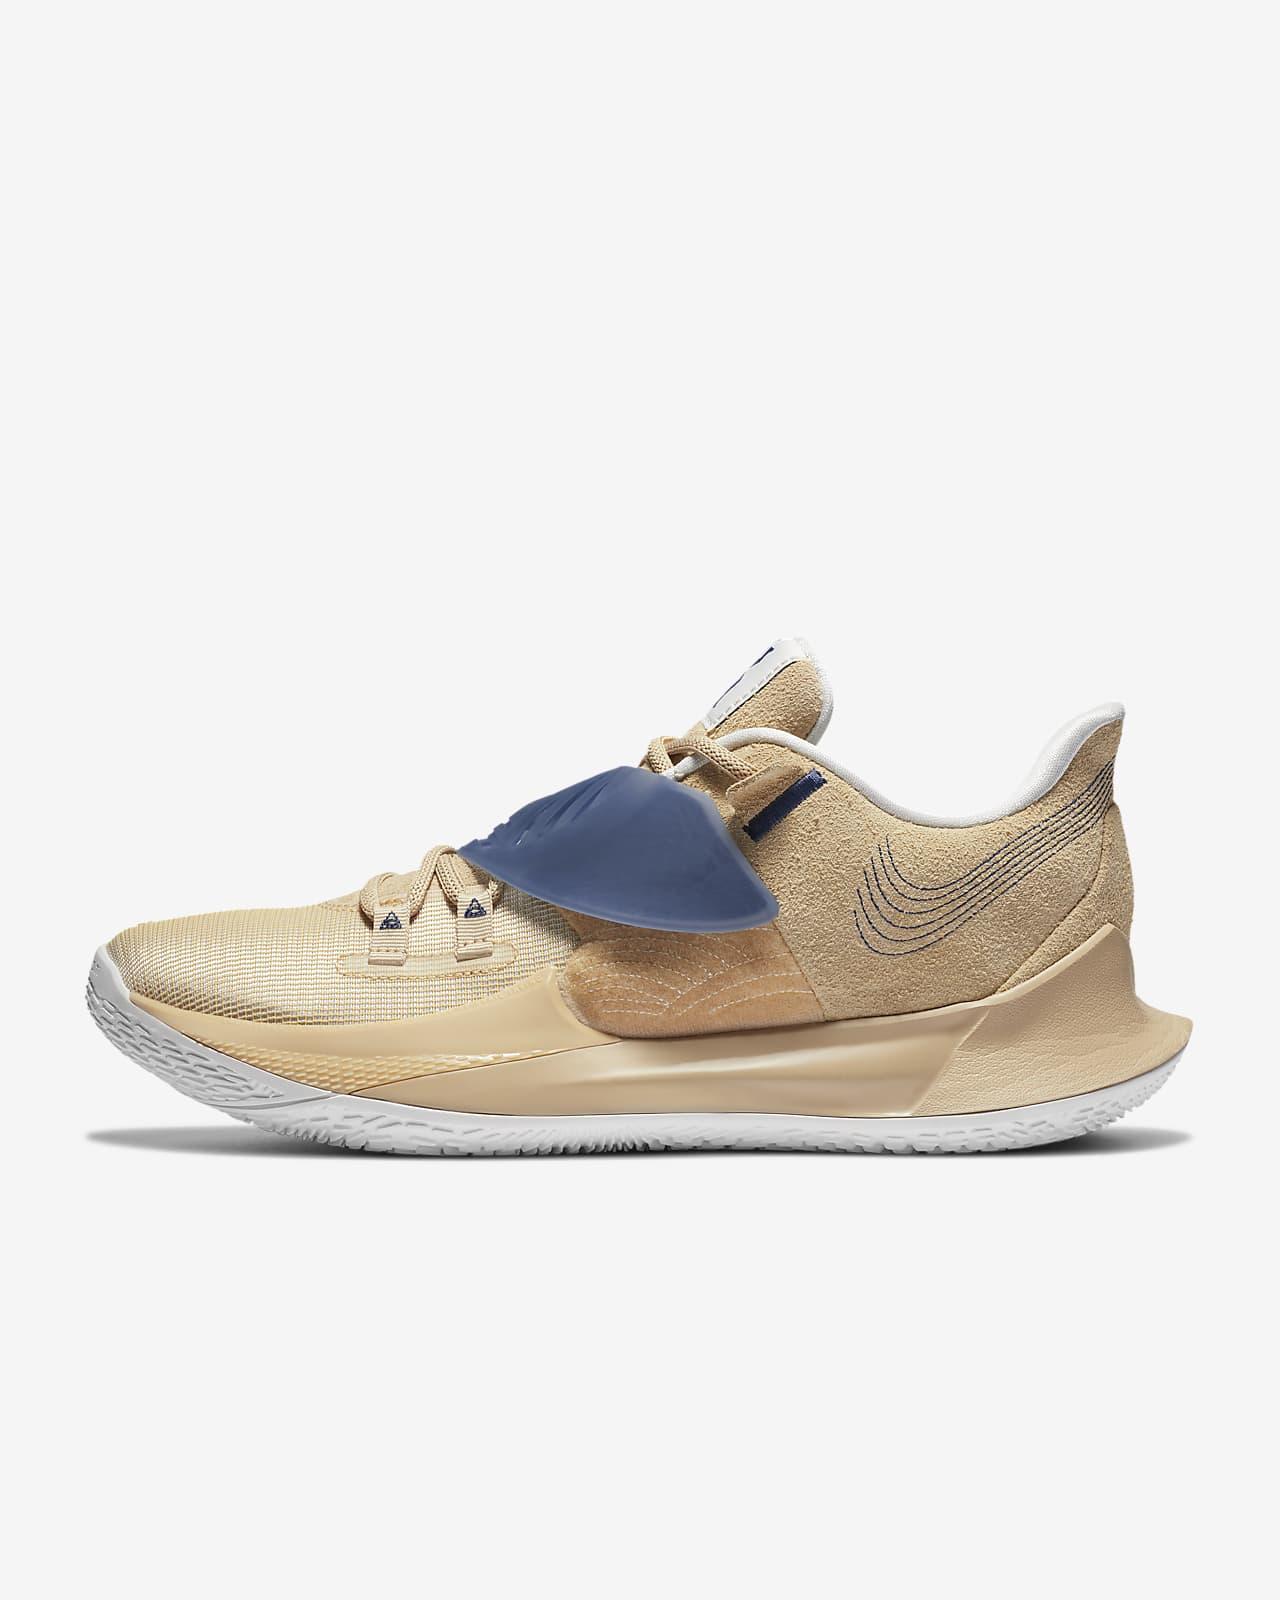 Kyrie Low 3 'Sashiko' Basketball Shoe